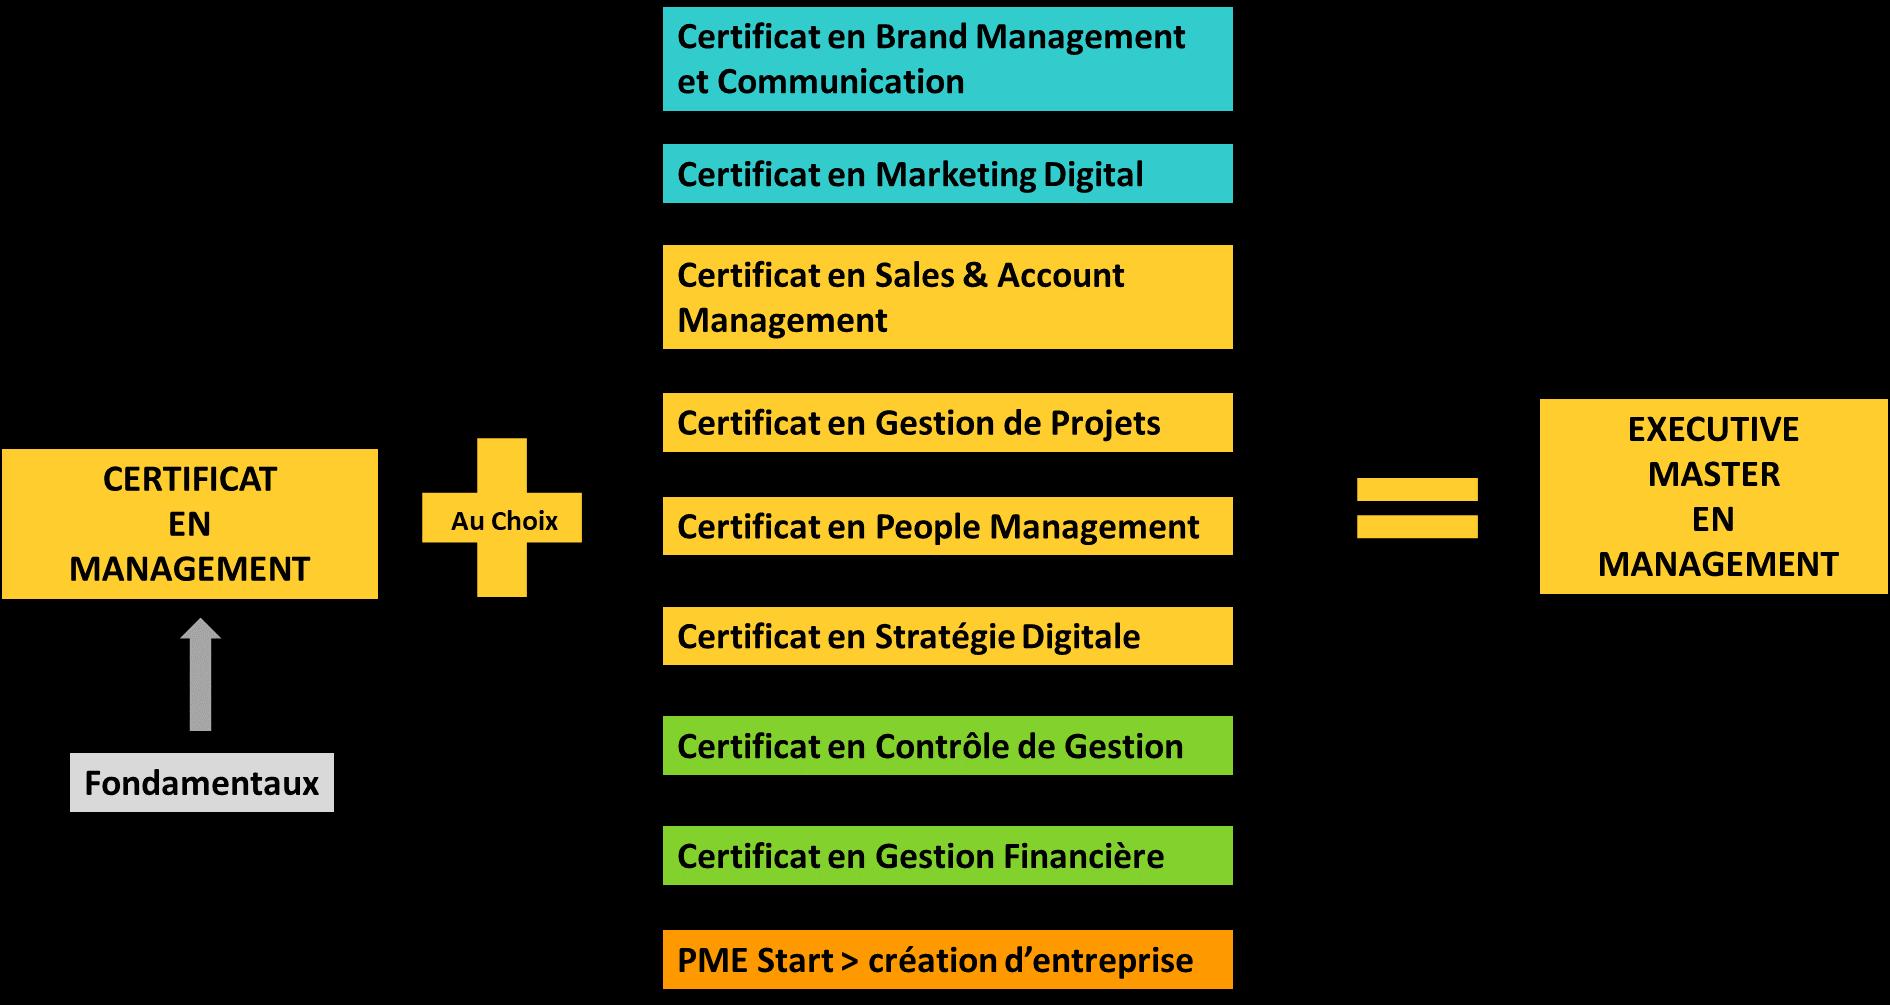 schema - EM Mgt1 - fondamentaux